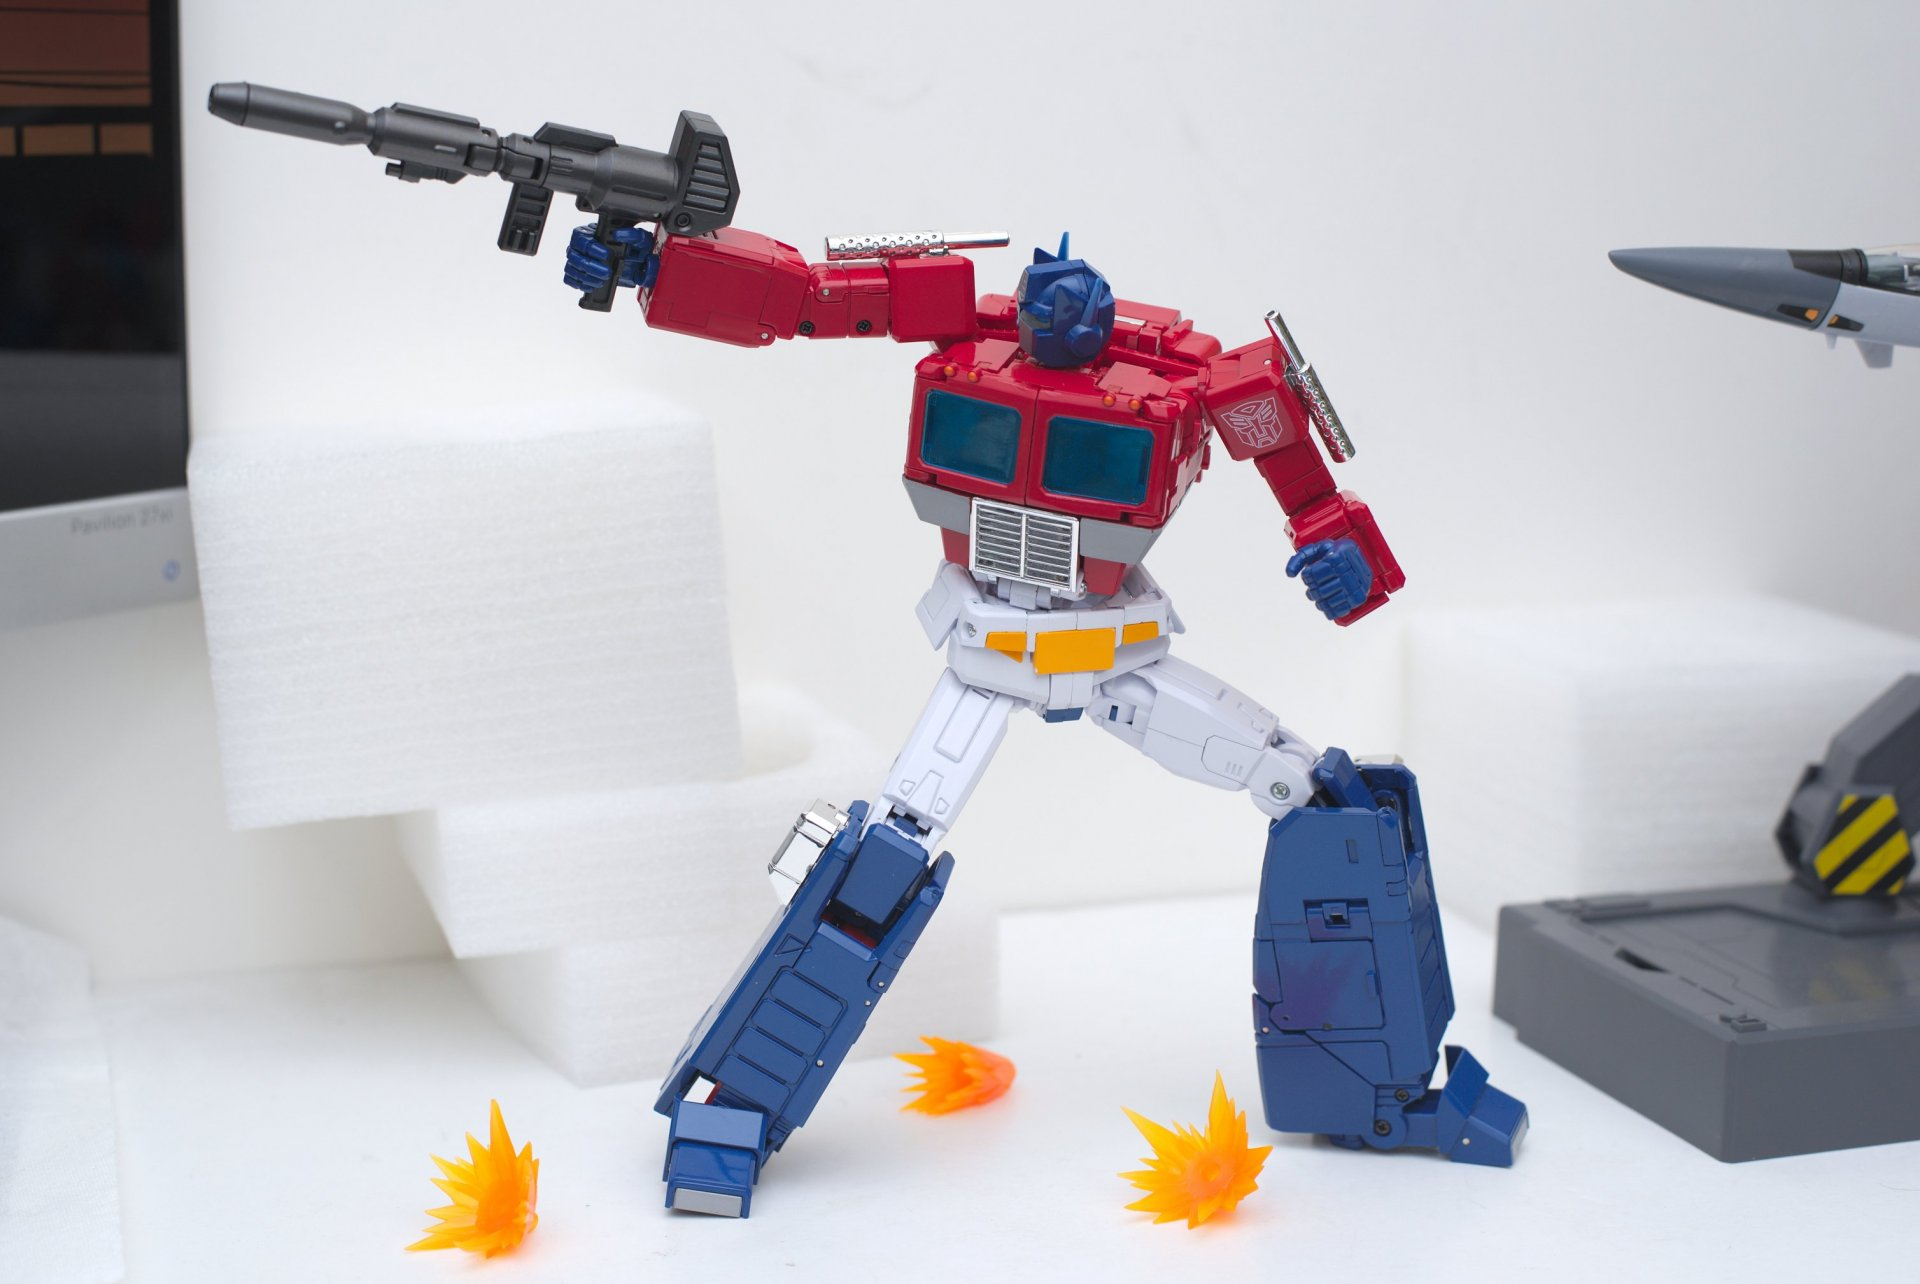 mp44-shootback1.thumb.jpg.c2120e612fd612d89bb419f8b19421b4.jpg